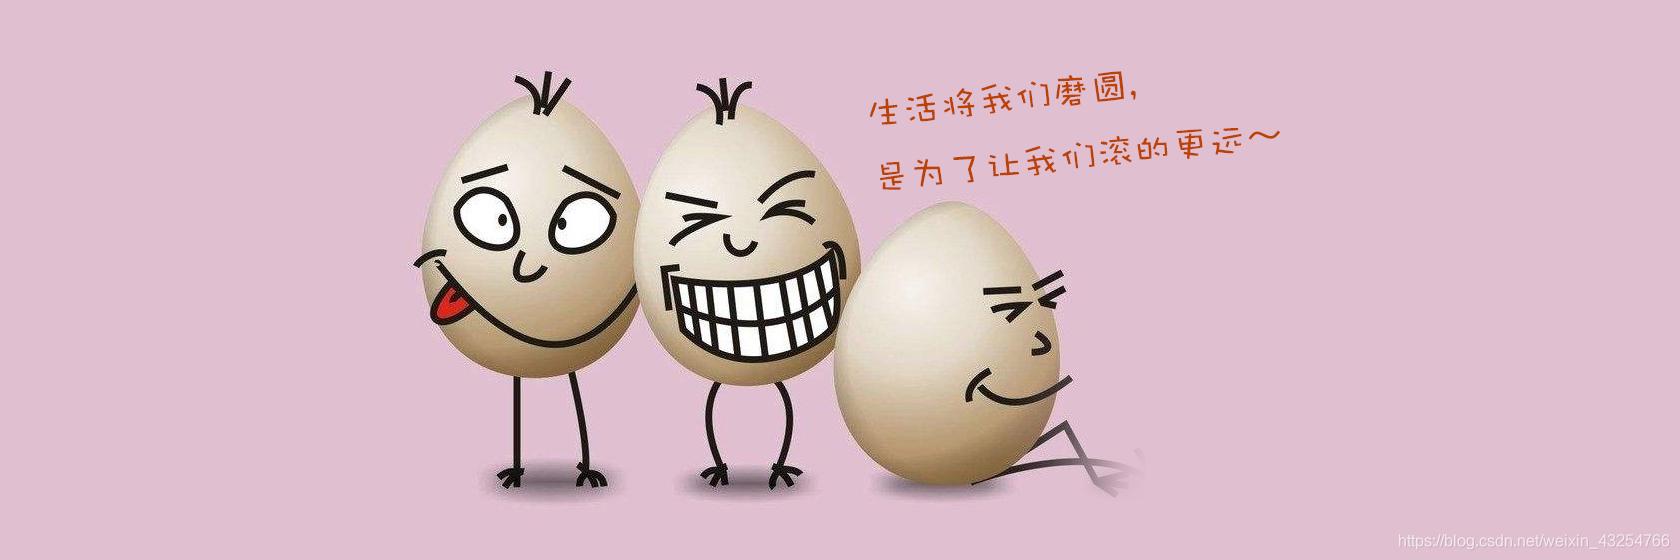 Js中文网 -前端进阶资源教程